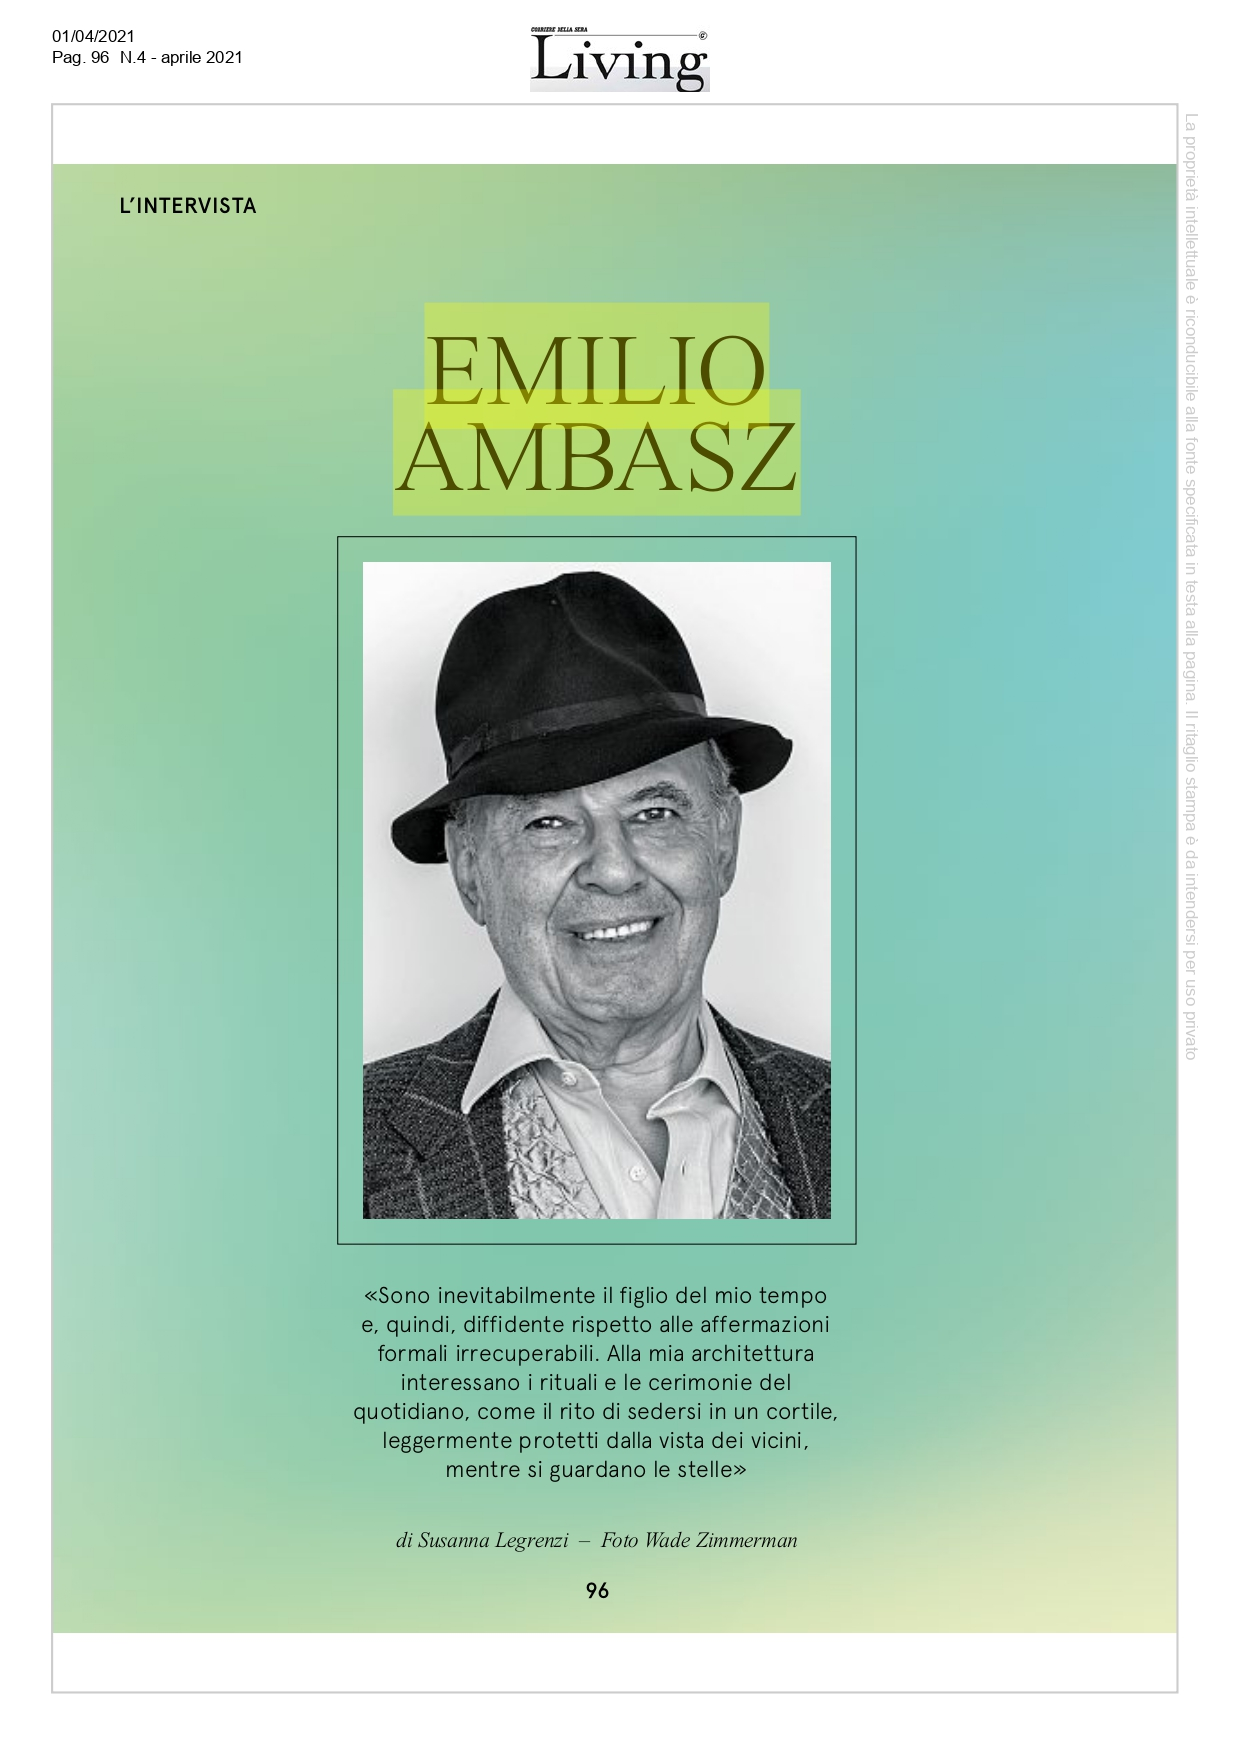 Living intervista Emilio Ambasz